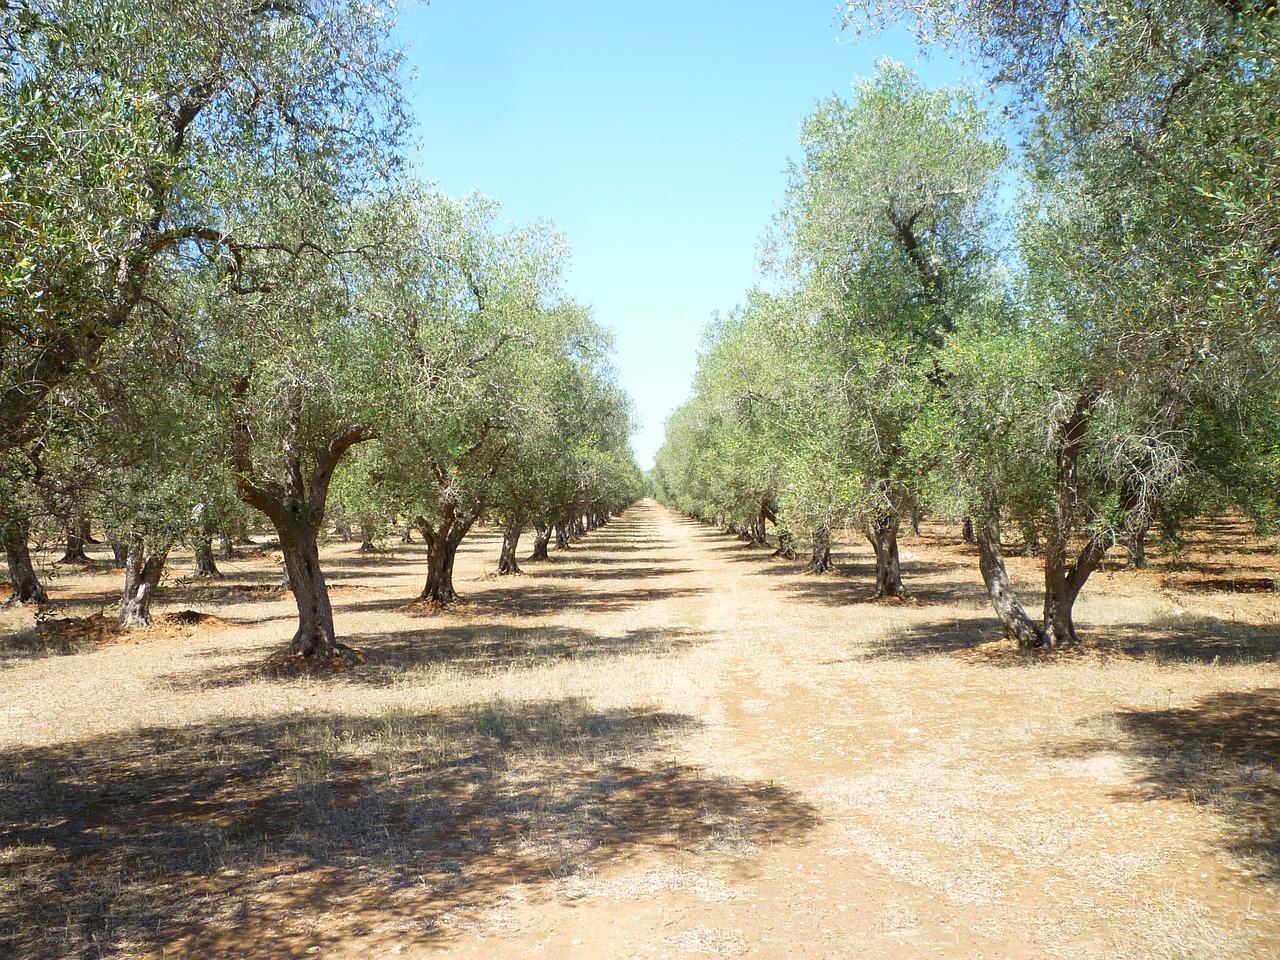 olívaültetvény